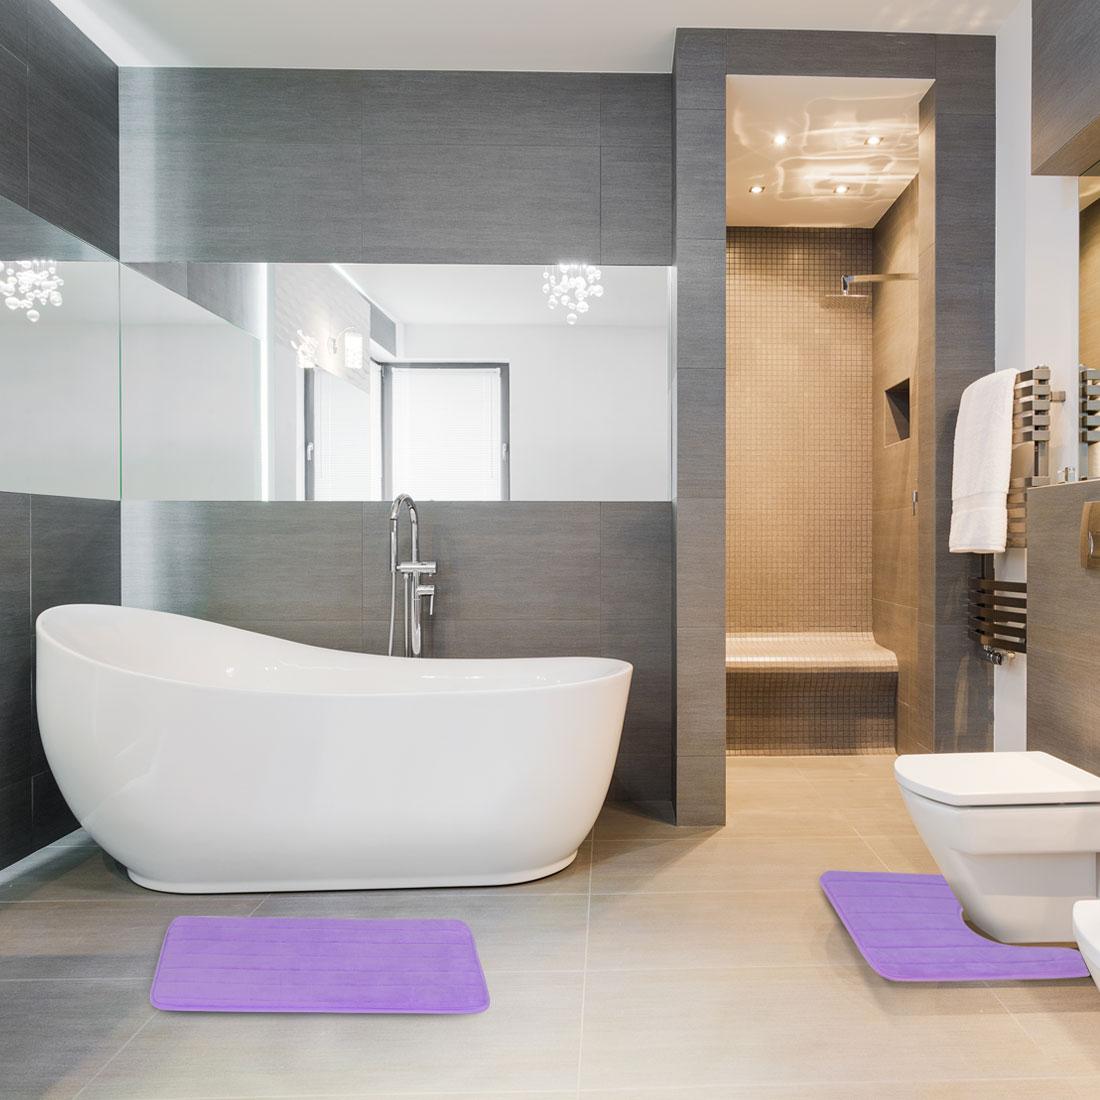 Home 2-Piece Memory Foam Bath Mat Set Non-slip Toliet Bath Rugs Carpet